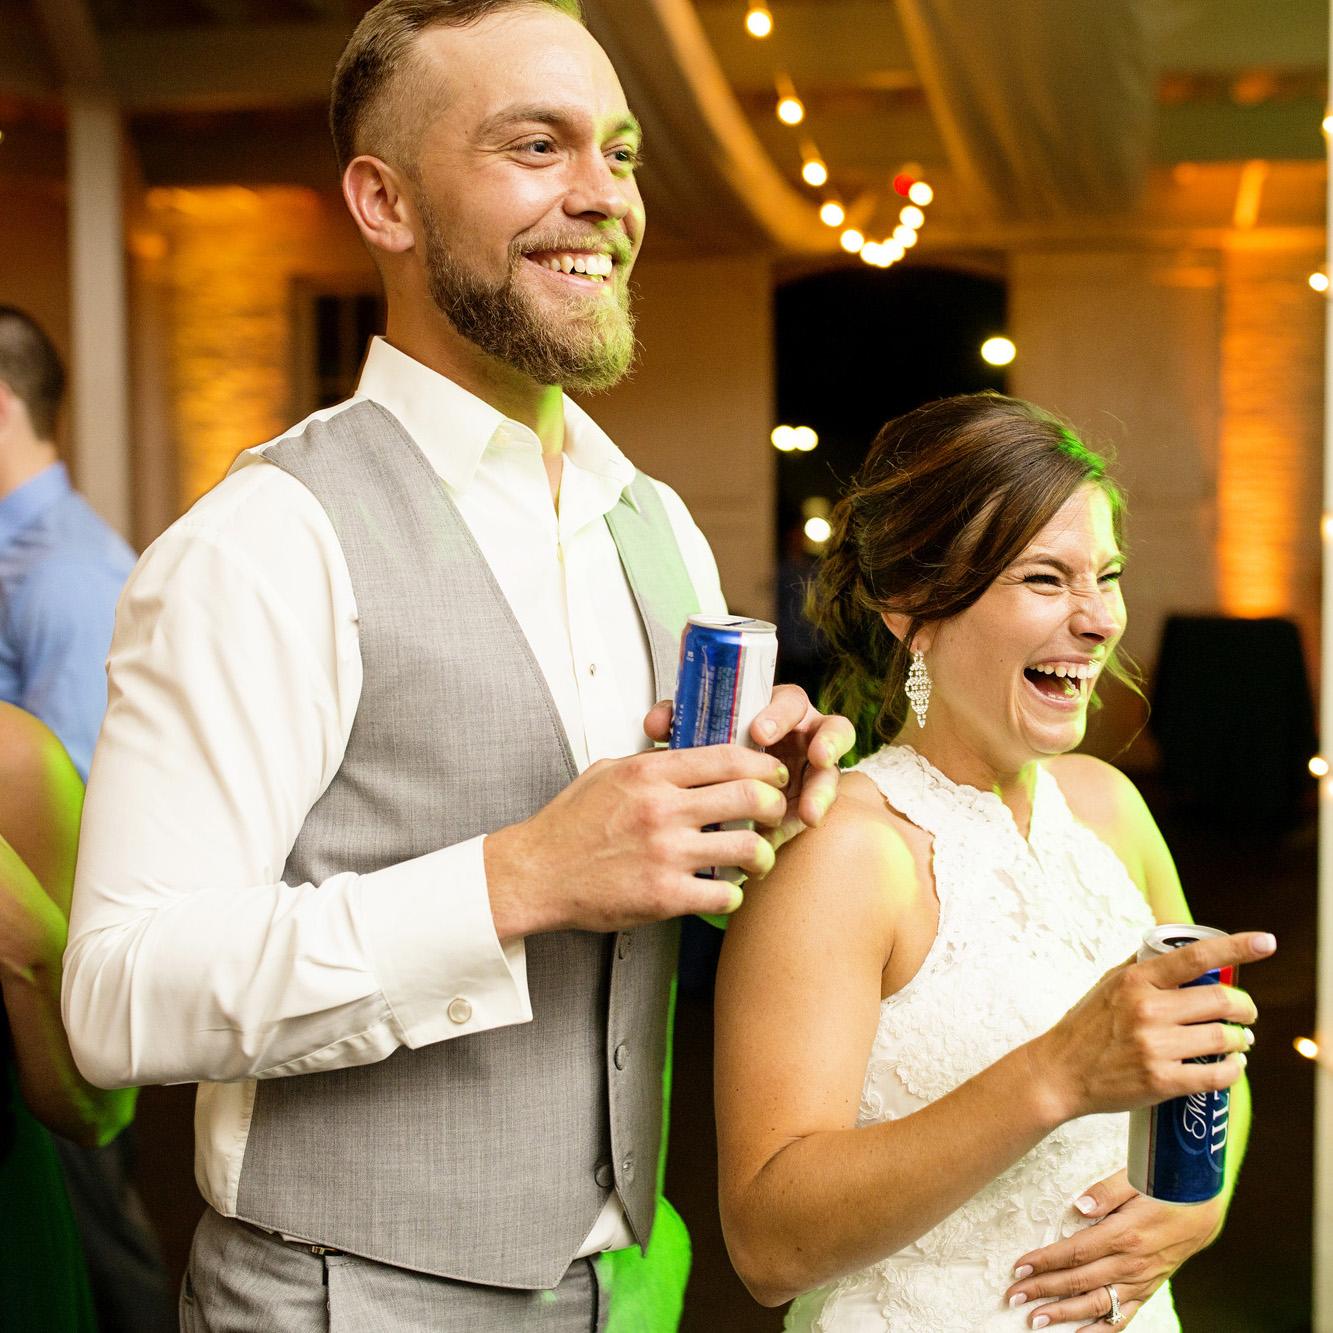 Seriously_Sabrina_Photography_Lexington_Kentucky_Round_Barn_Red_Mile_Stable_of_Memories_Wedding_Hart_139.jpg